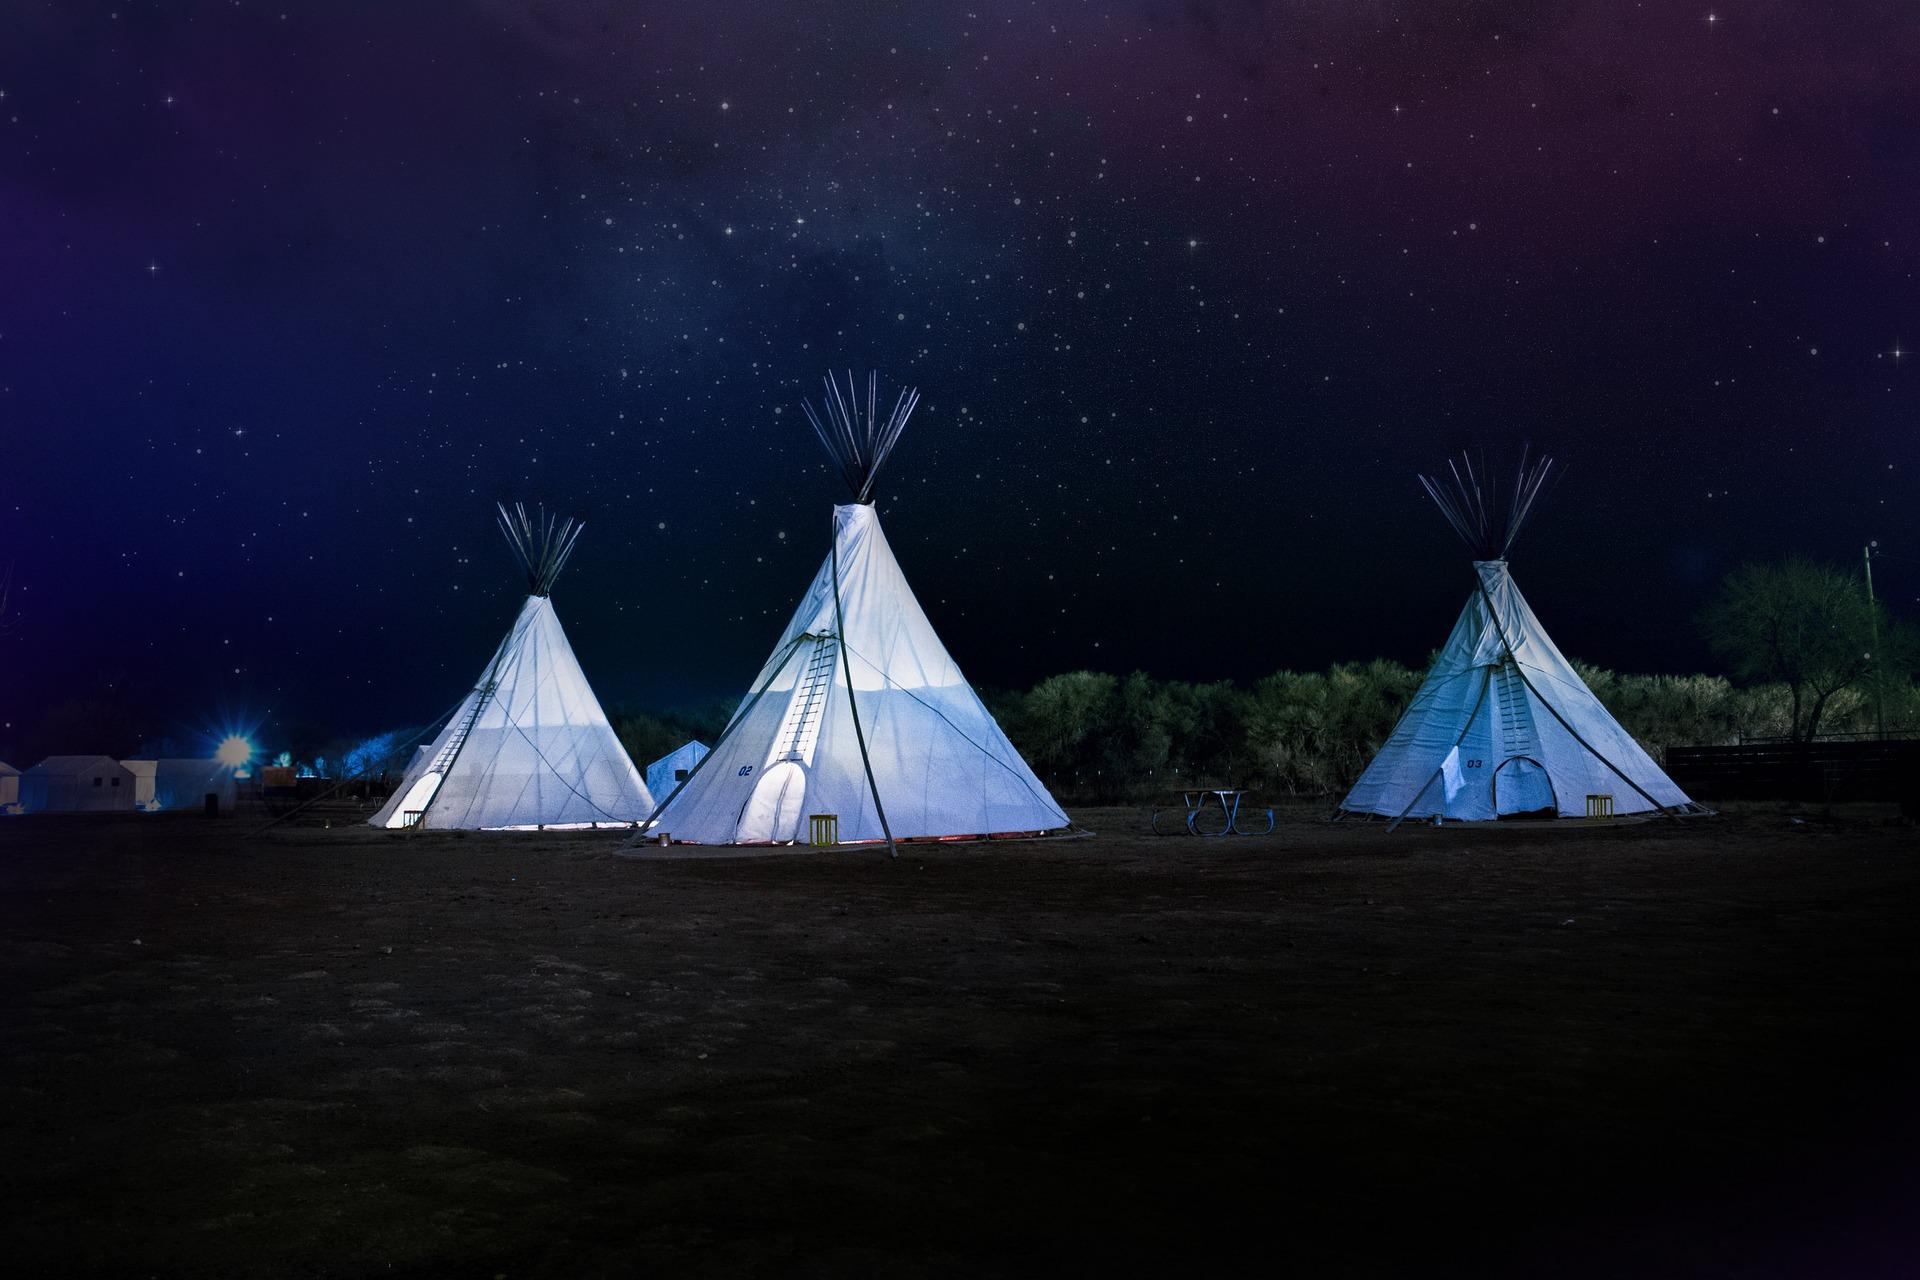 Glamping: Luxus Camping - Unterkünfte in Holland, Frankreich & am Meer